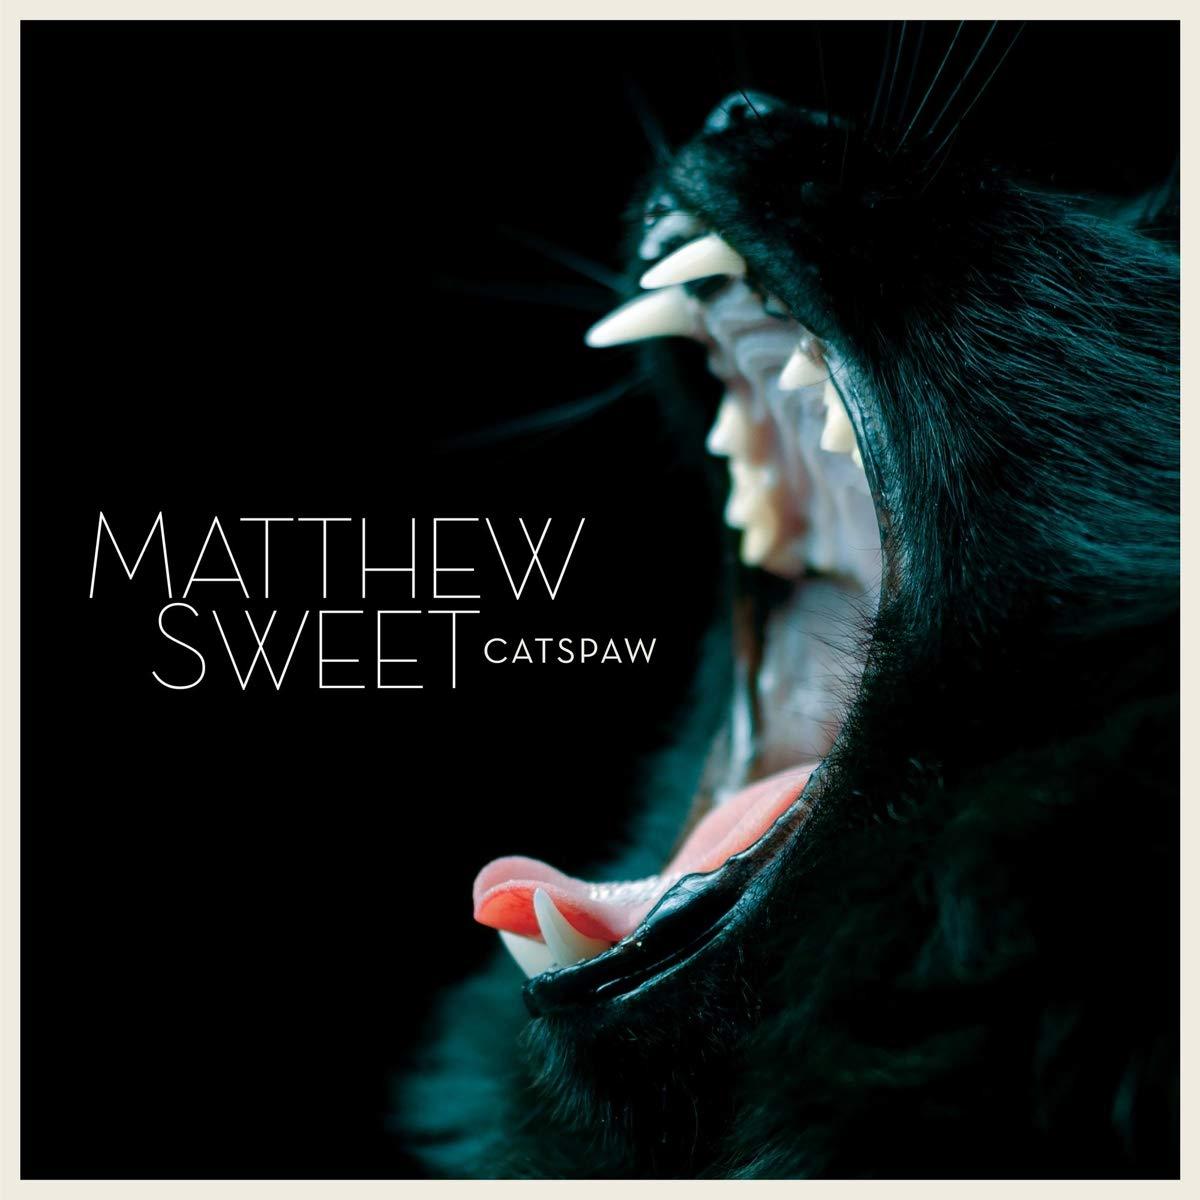 Matthew Sweet: Catspaw [Album Review]